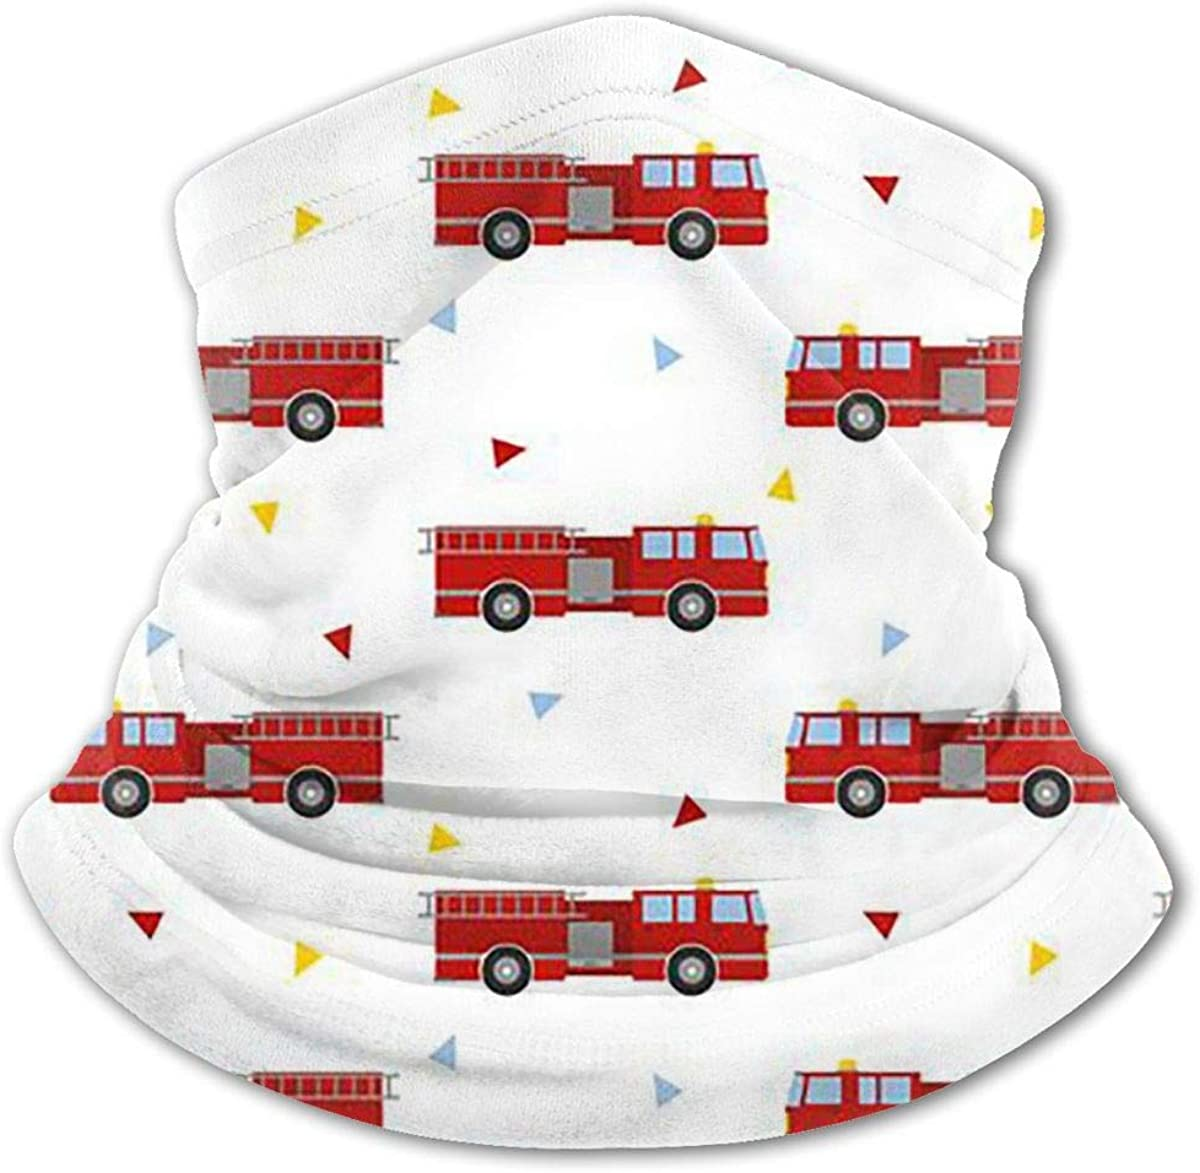 Fire Truck Headwear For Girls And Boys, Head Wrap, Neck Gaiter, Headband, Tenn Fishing Mask, Magic Scarf, Tube Mask, Face Bandana Mask For Camping Running Cycling